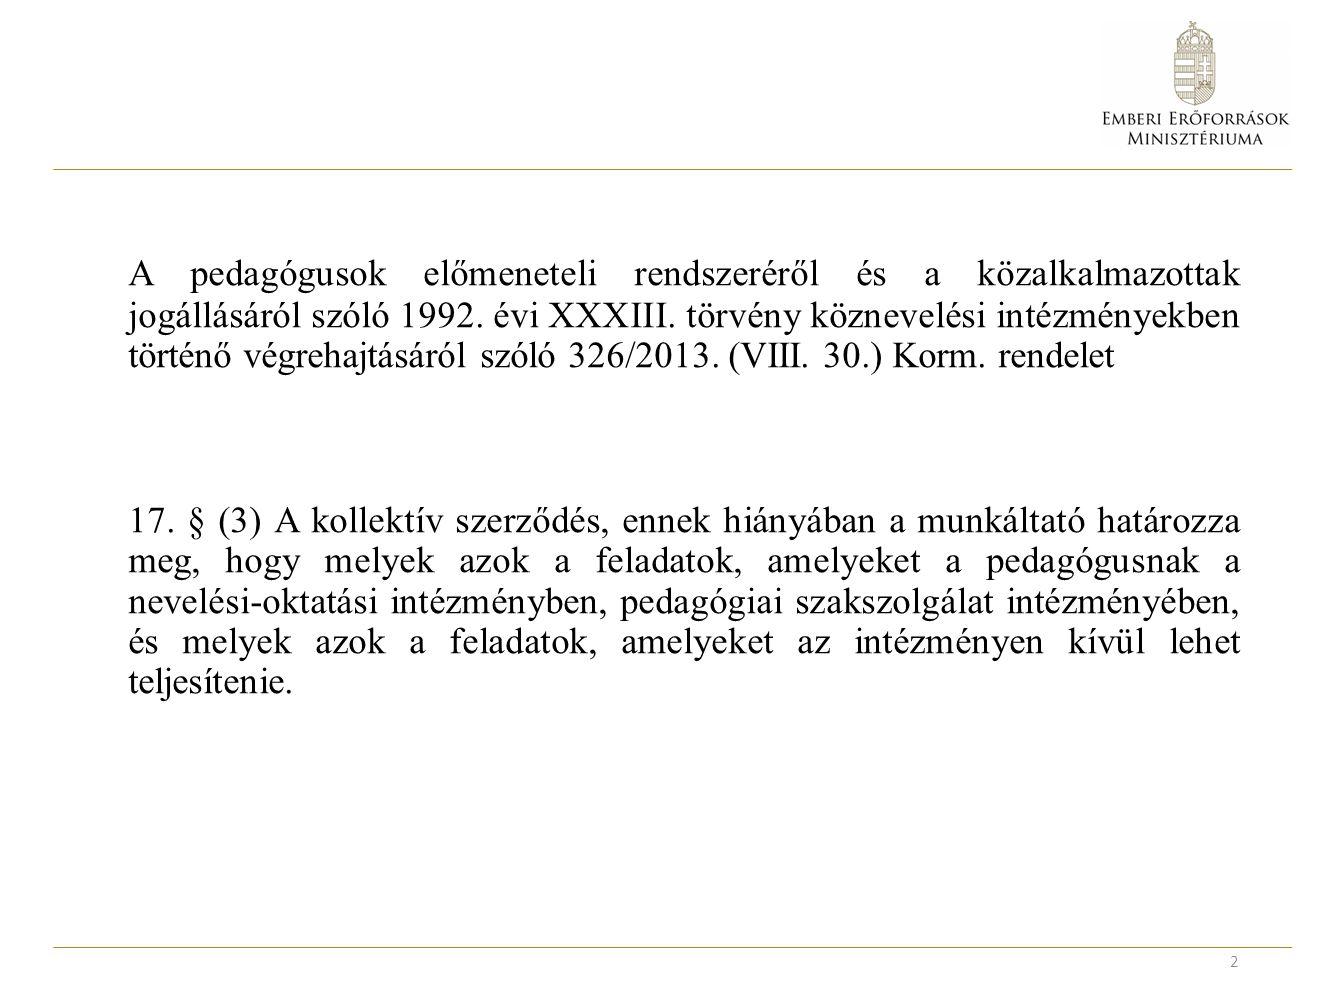 36.§ (4) A 2015.január 1-jén ideiglenesen Pedagógus II.